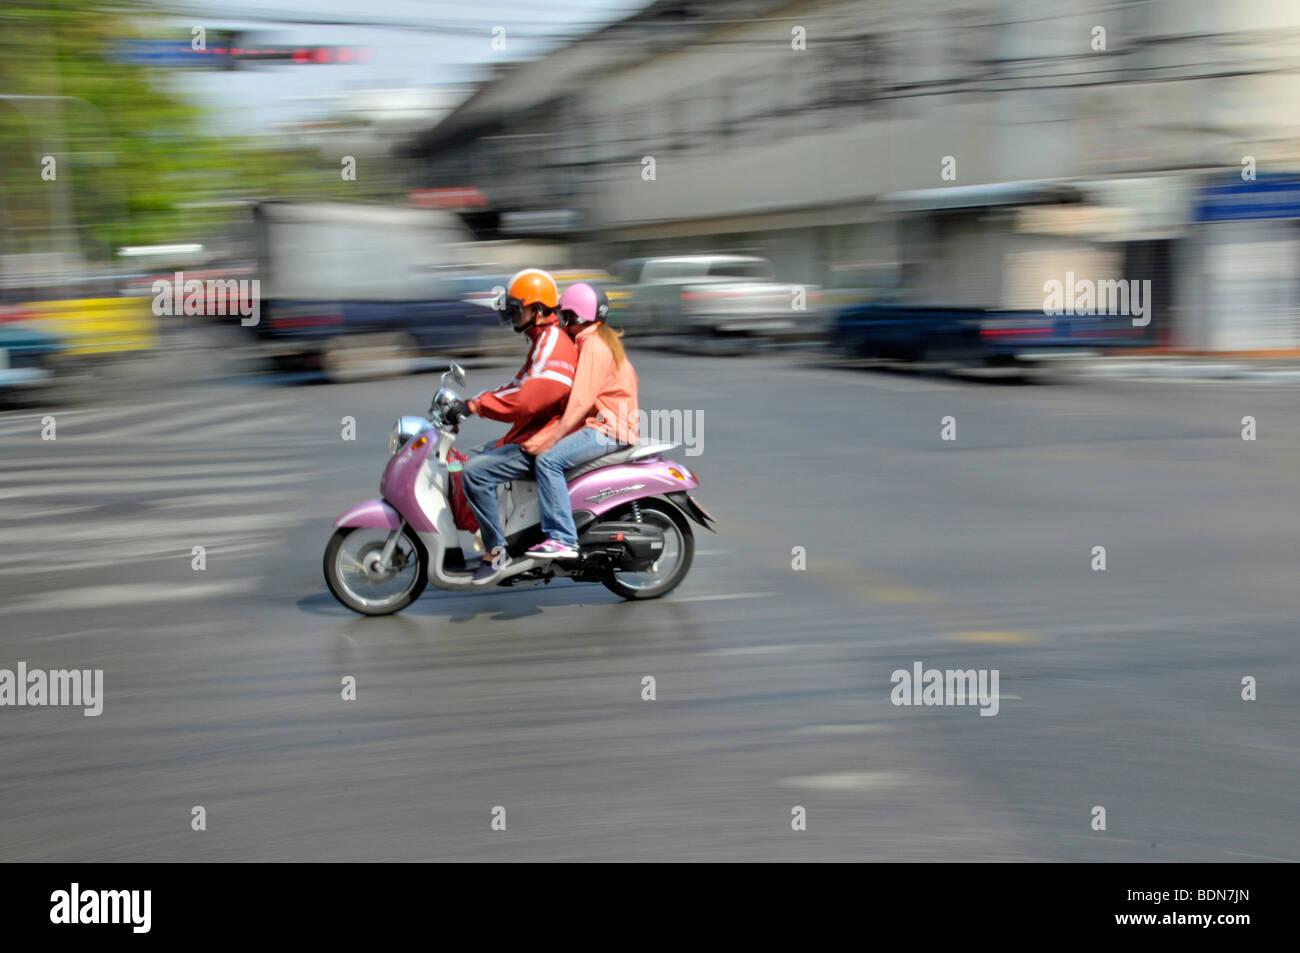 Moped with pillion passenger in traffic chaos, Ratchamnoen Klang Road, Bangkok, Thailand, Asia - Stock Image